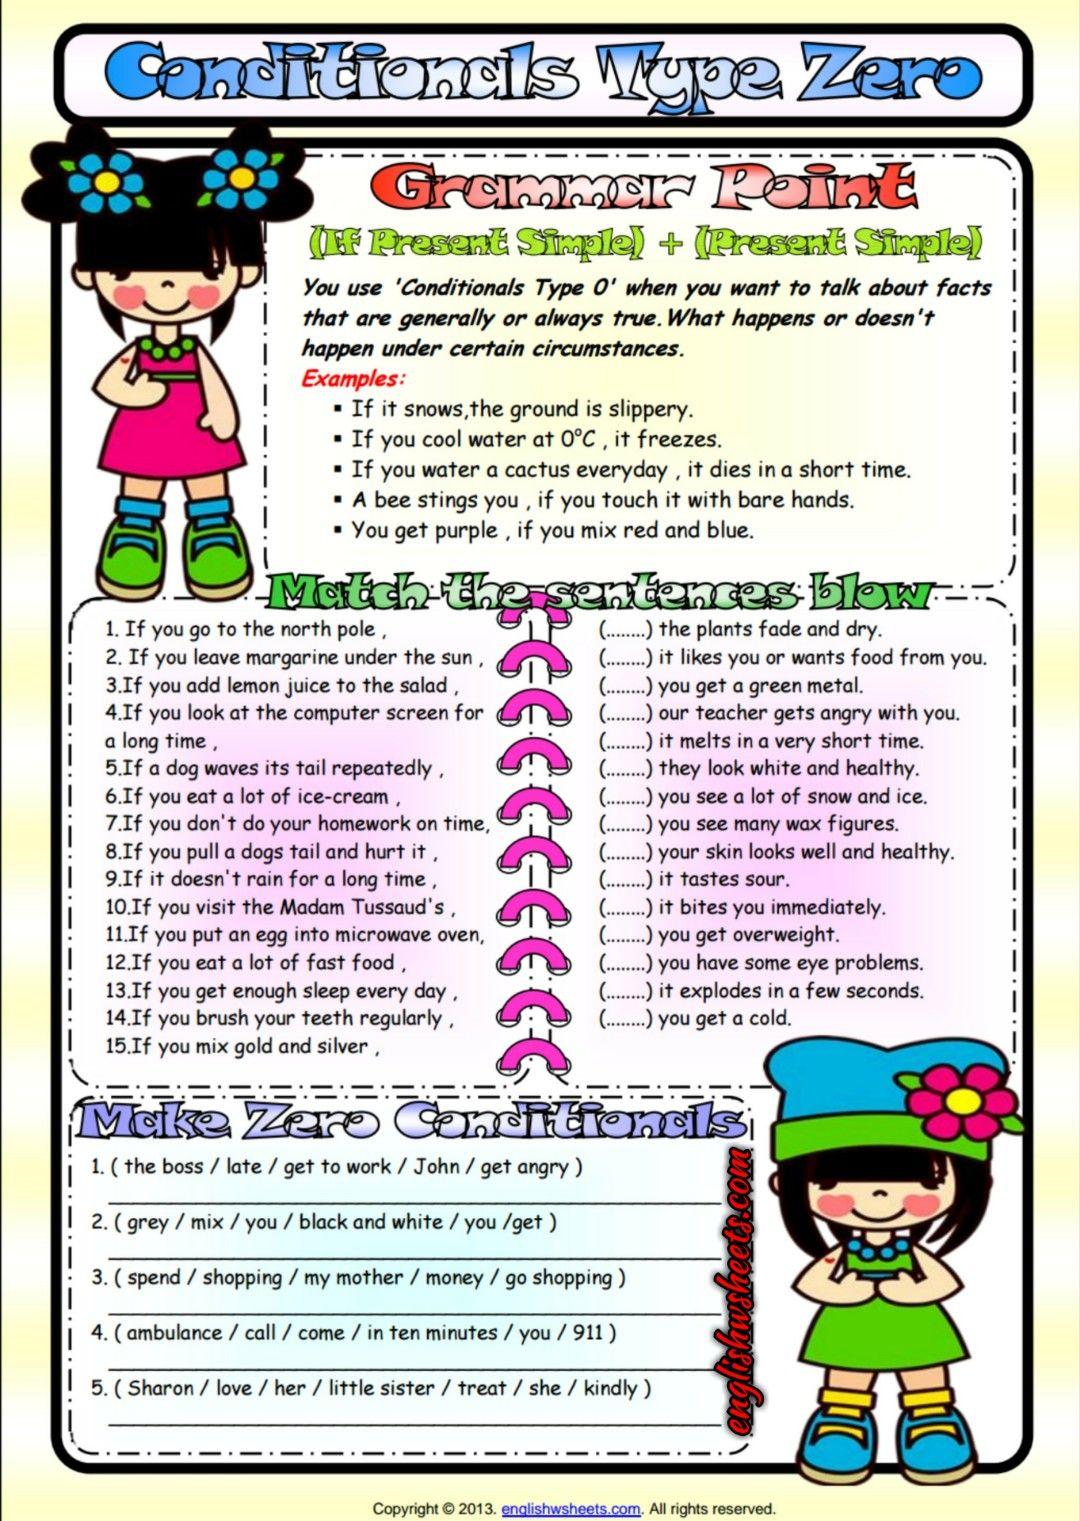 Conditionals Type 0 Esl Grammar Exercises Worksheet How To Introduce Yourself Speaking Activities English Teaching Materials [ 1521 x 1080 Pixel ]